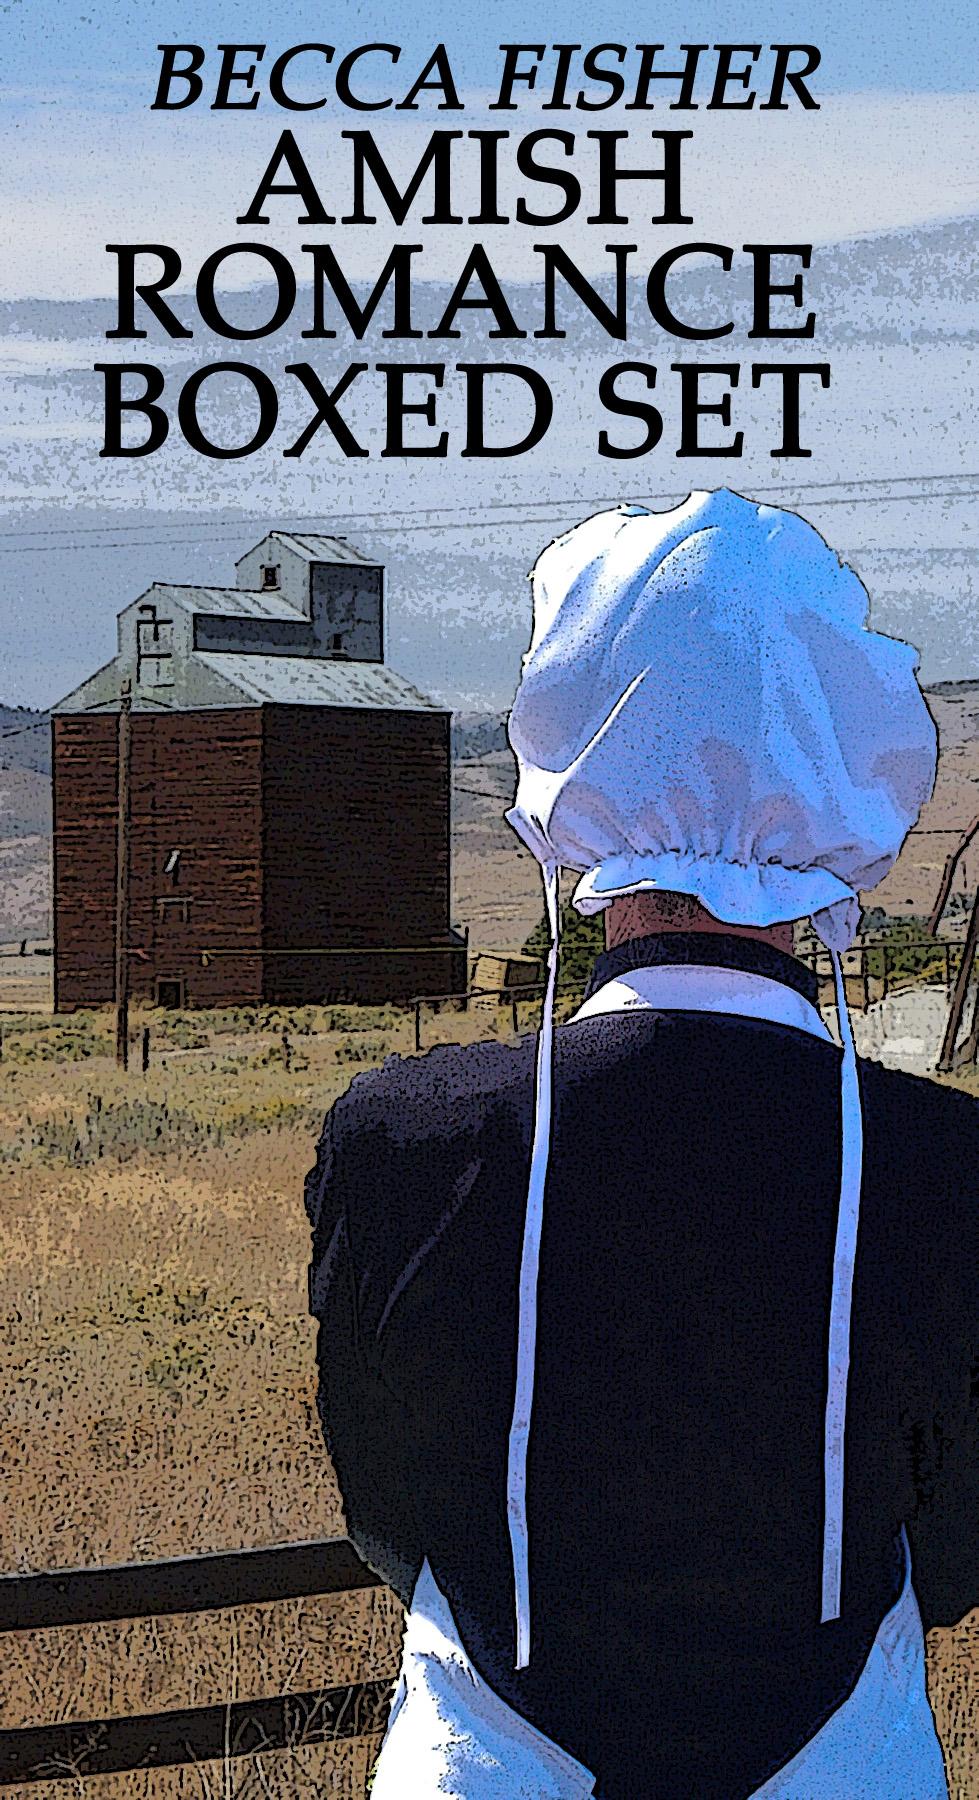 Becca Fisher - Amish Romance Boxed Set